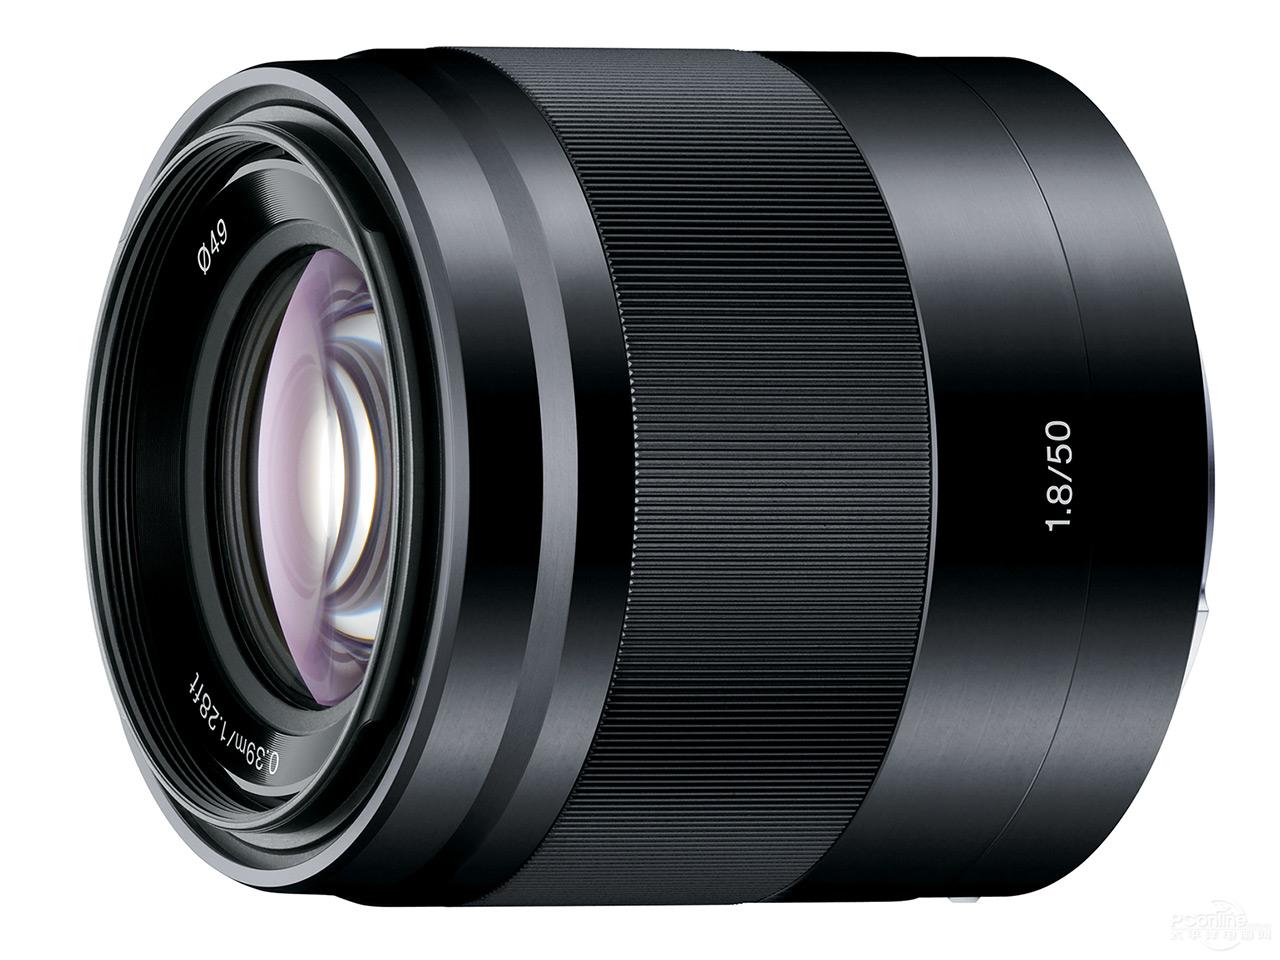 SONY E 50mm F1.8 定焦镜头